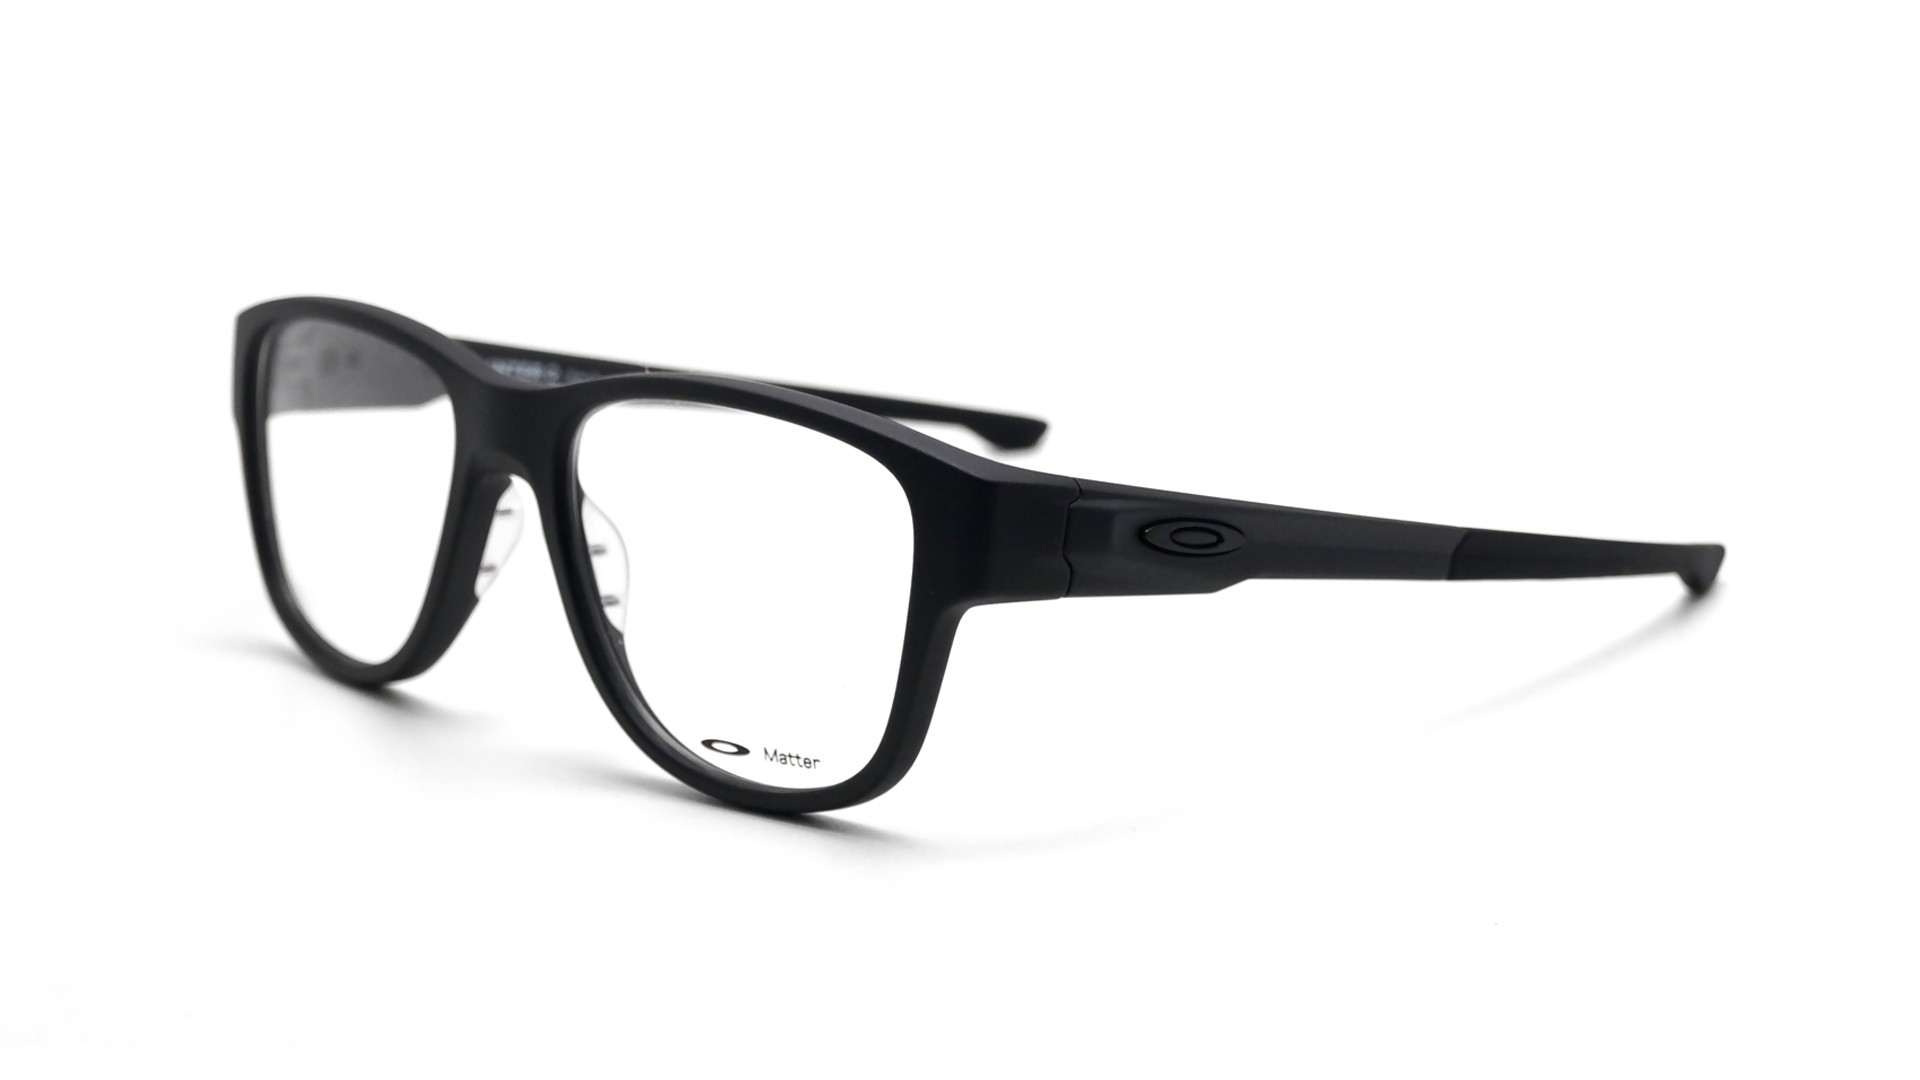 2 53 18 0 01 Medium Oakley Black Ox8094 Splinter dxrCeBWo